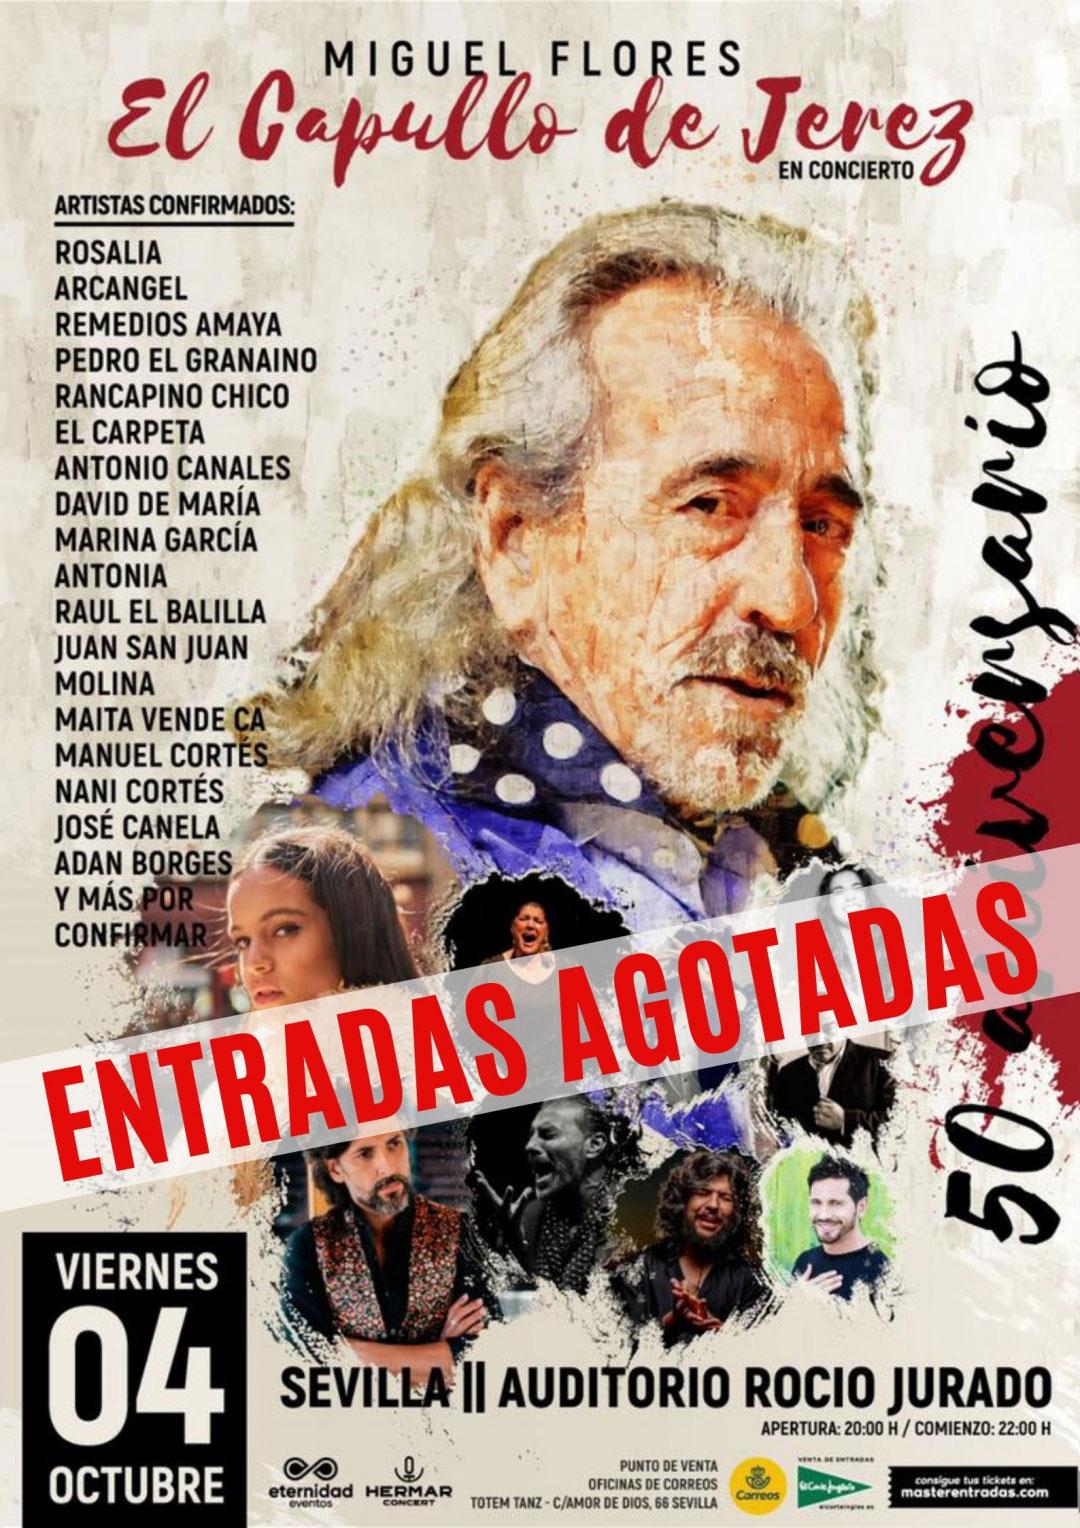 Capullo de Jerez - Rosalía